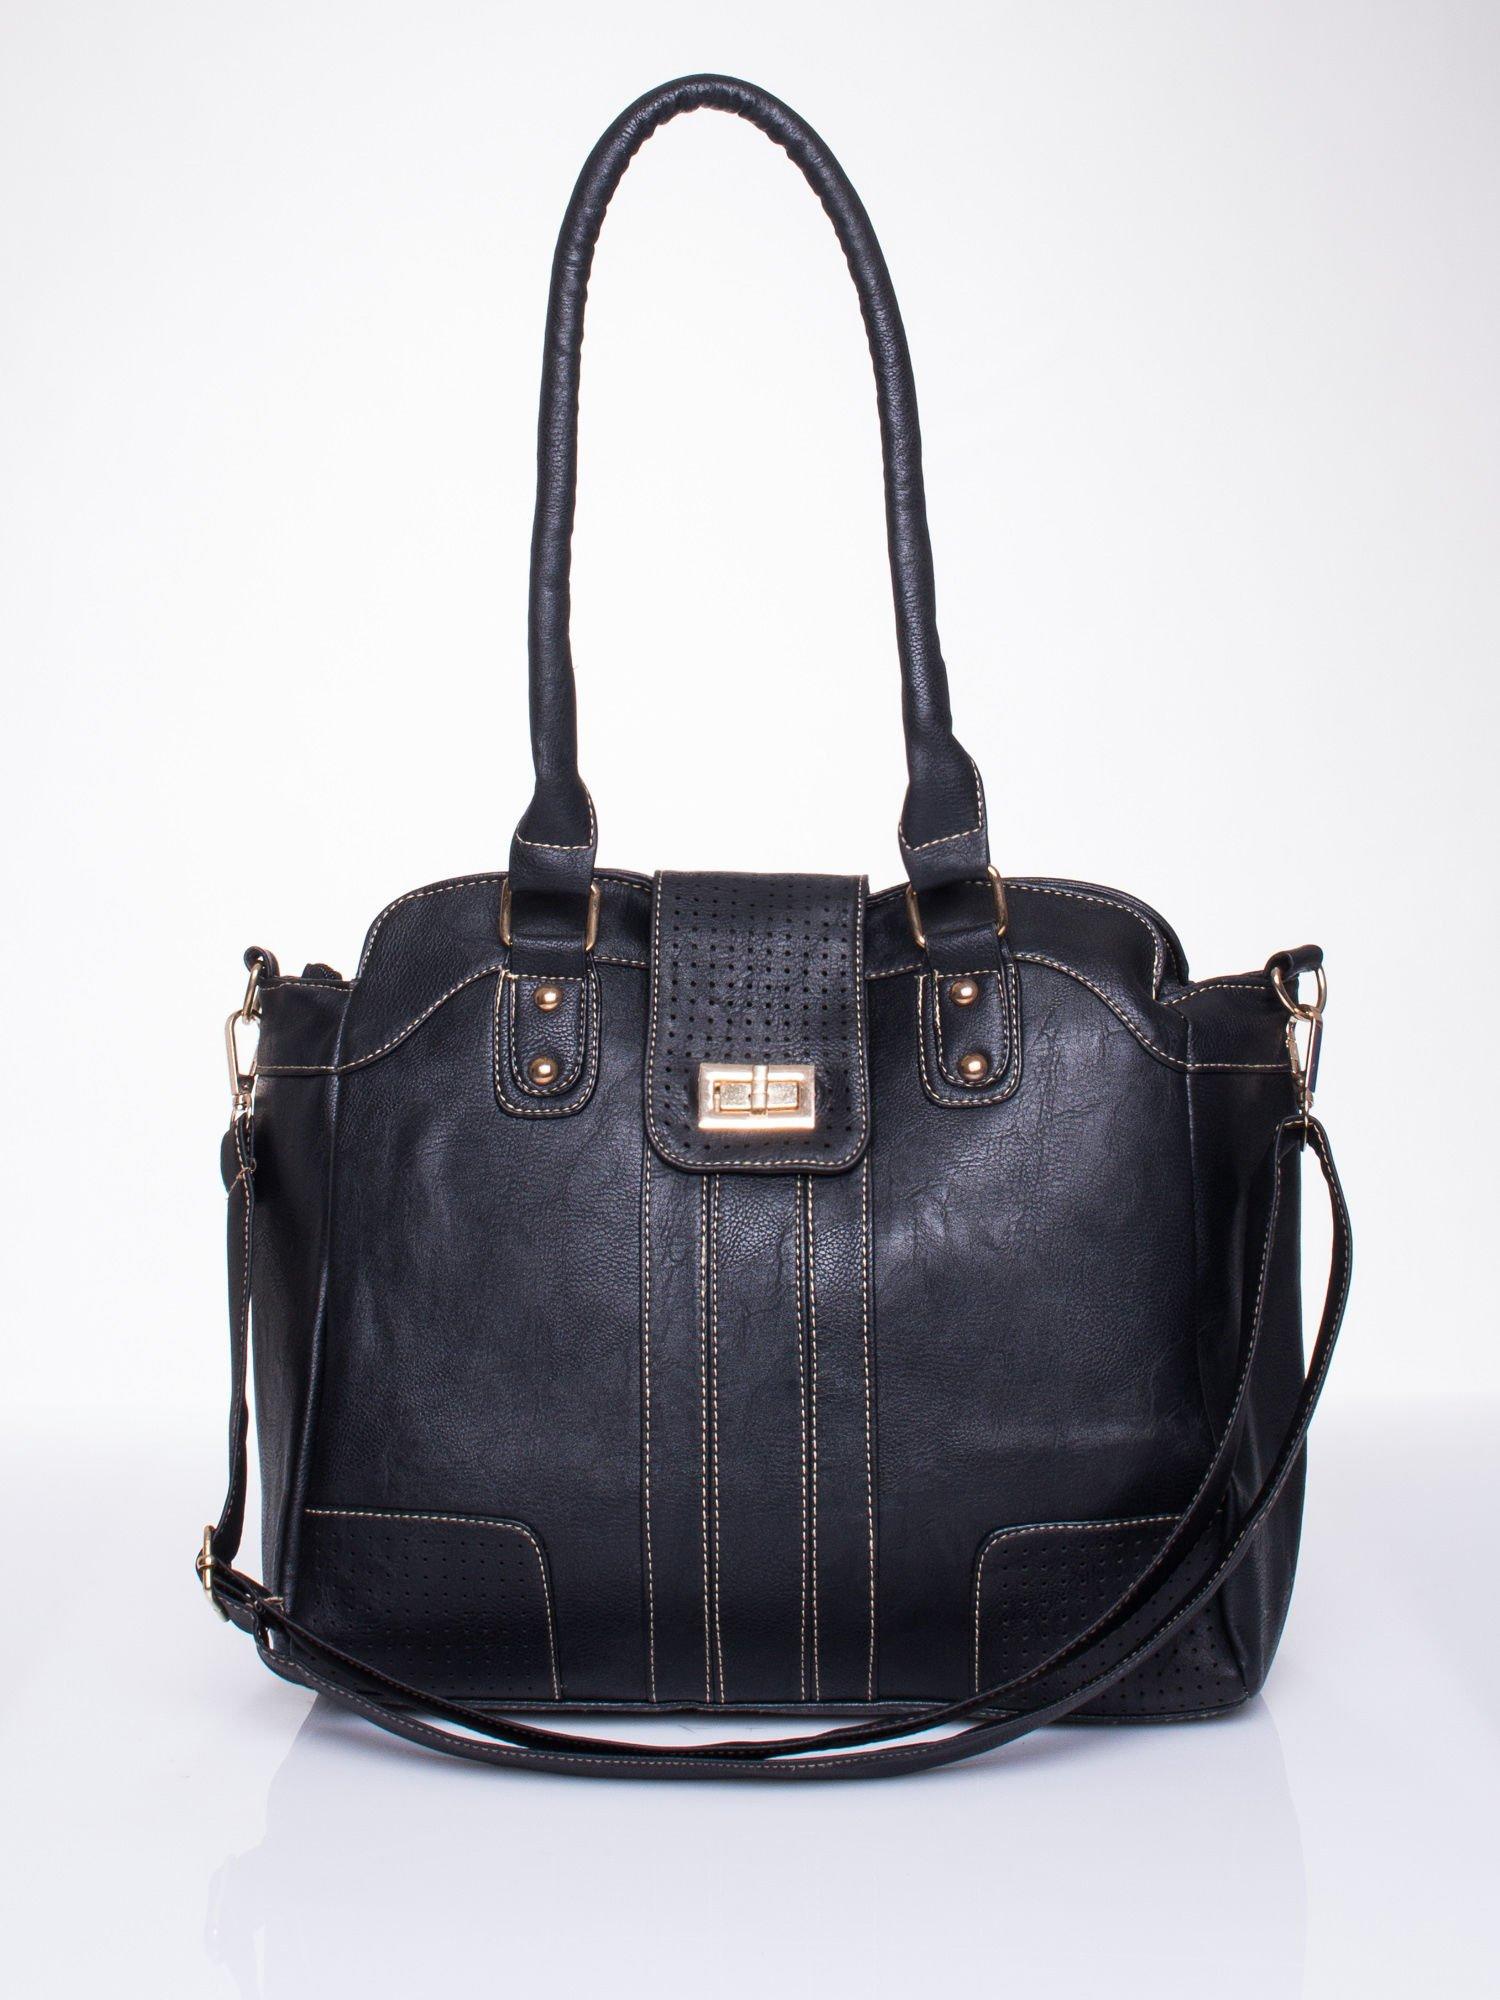 Czarna torba miejska z klapką                                  zdj.                                  1